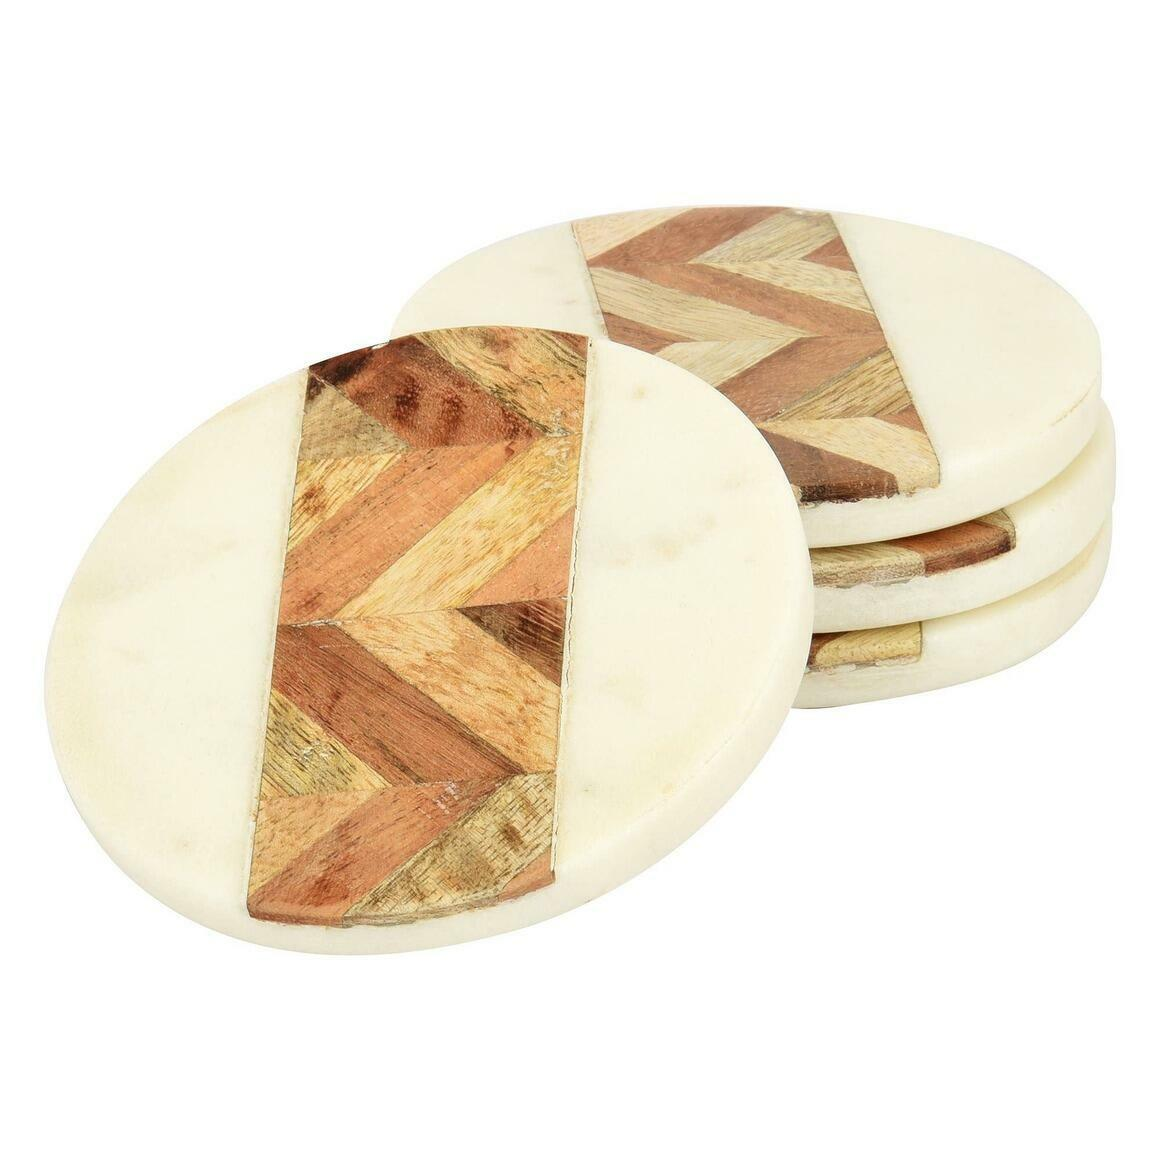 Cleo Marble & Wood Coasters (Set of 4)   Trada Marketplace